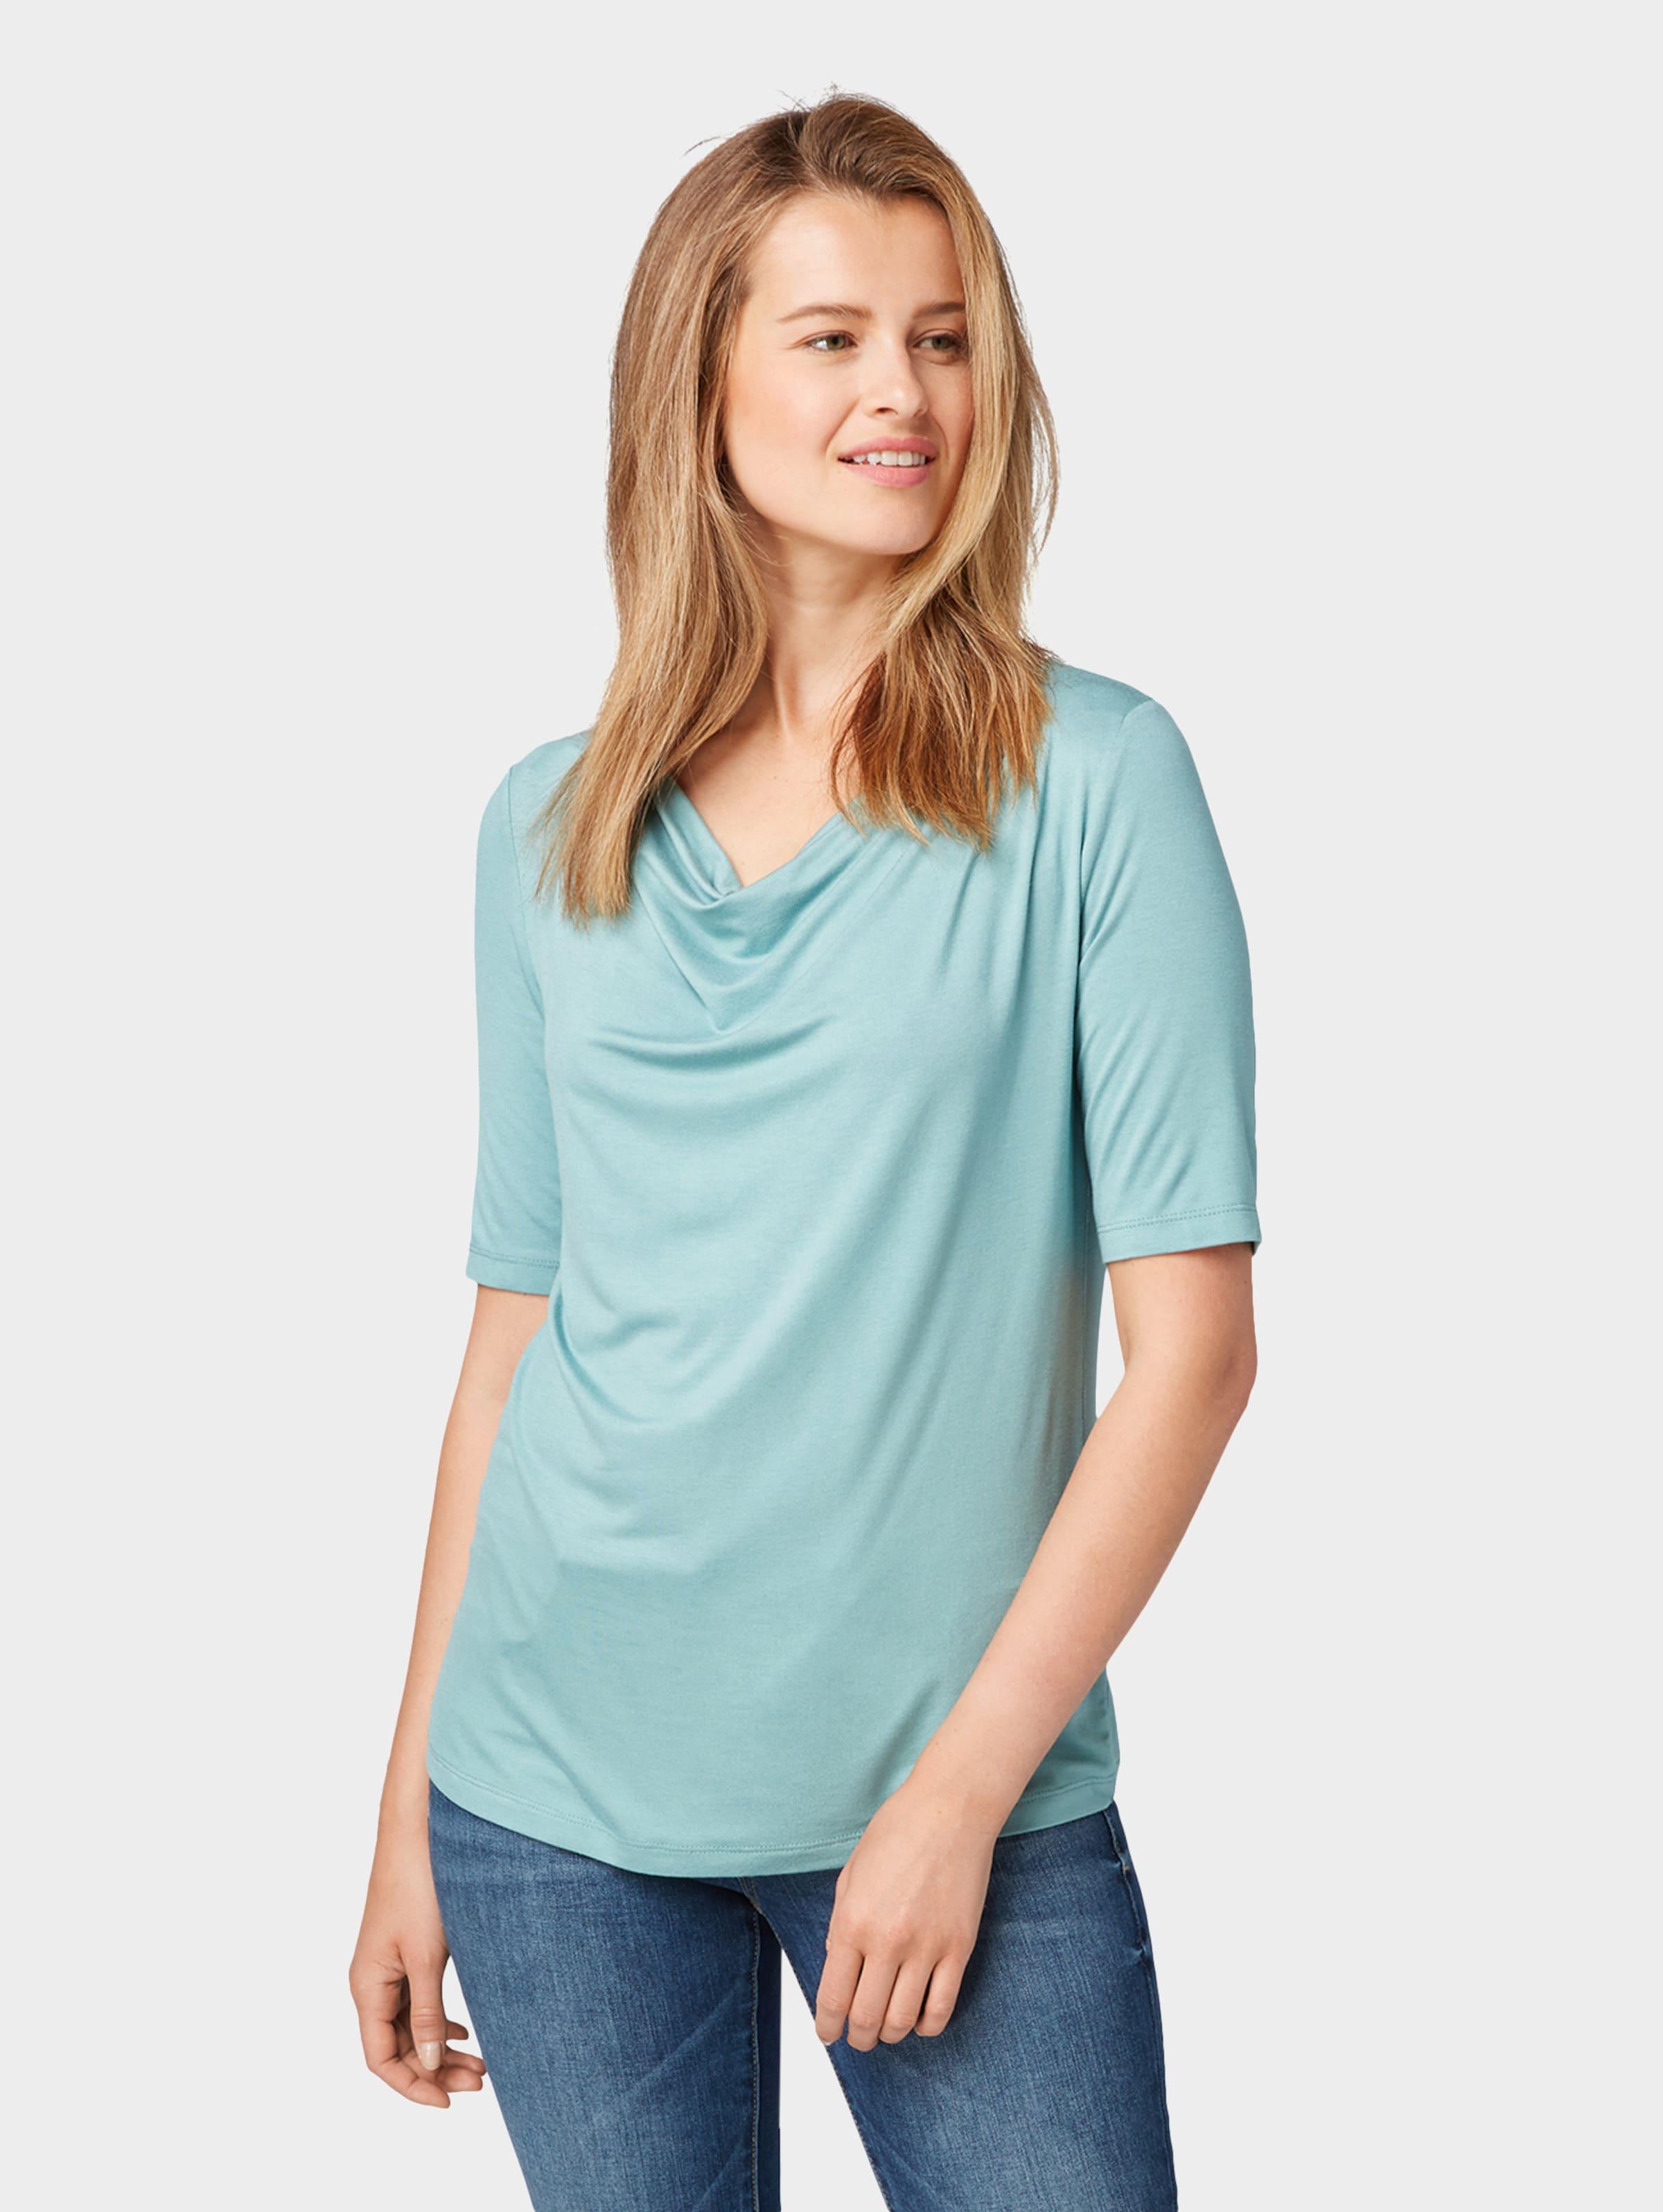 Tom shirt Hellblau T In Tailor CWdxoreBQ